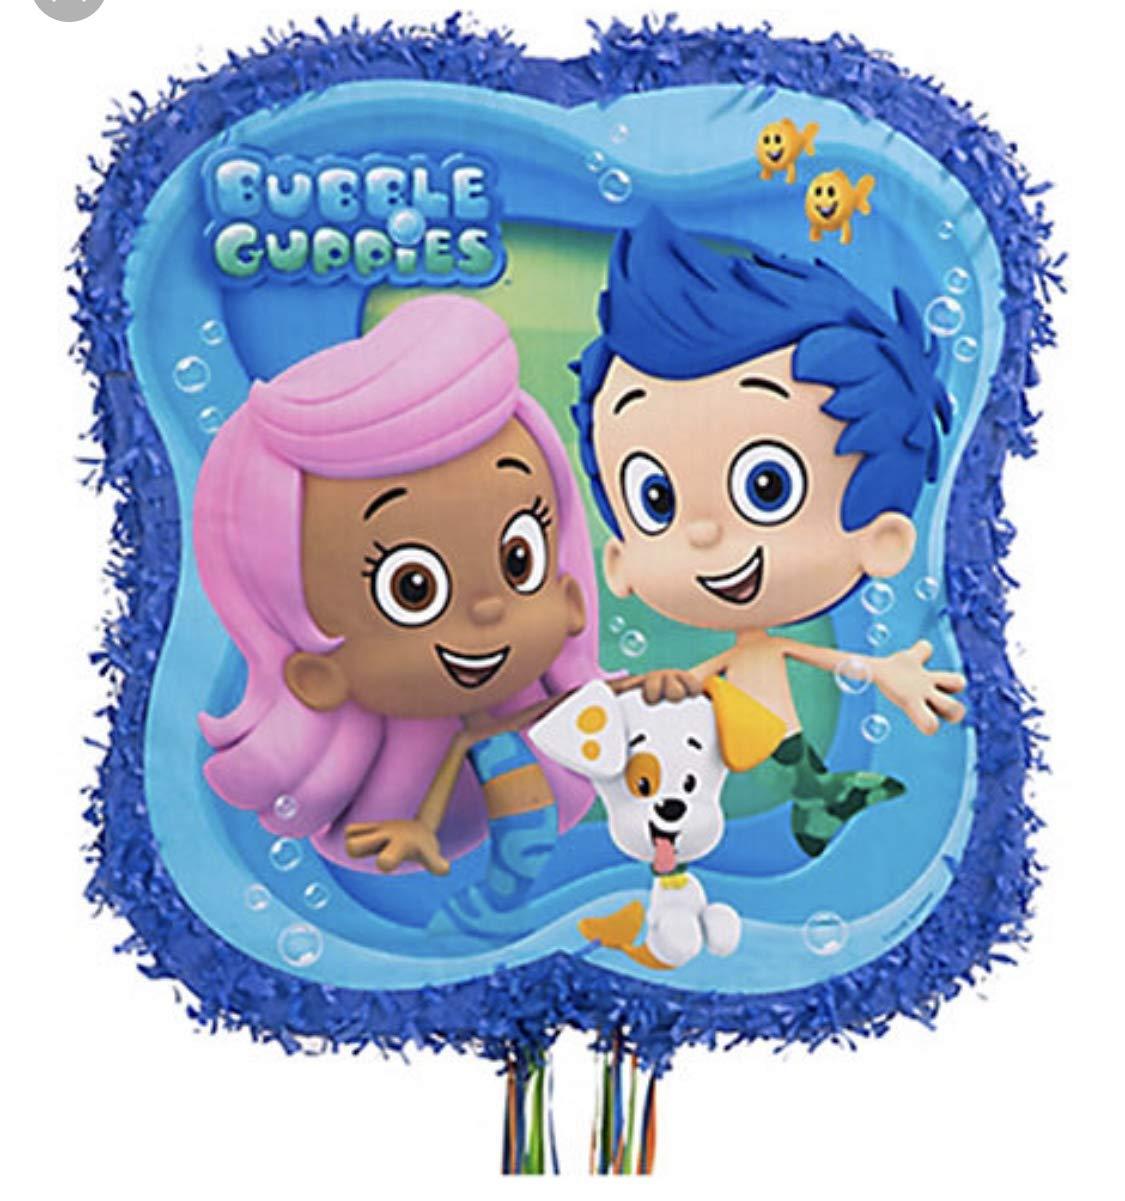 Bubble Guppies Outline Pinata